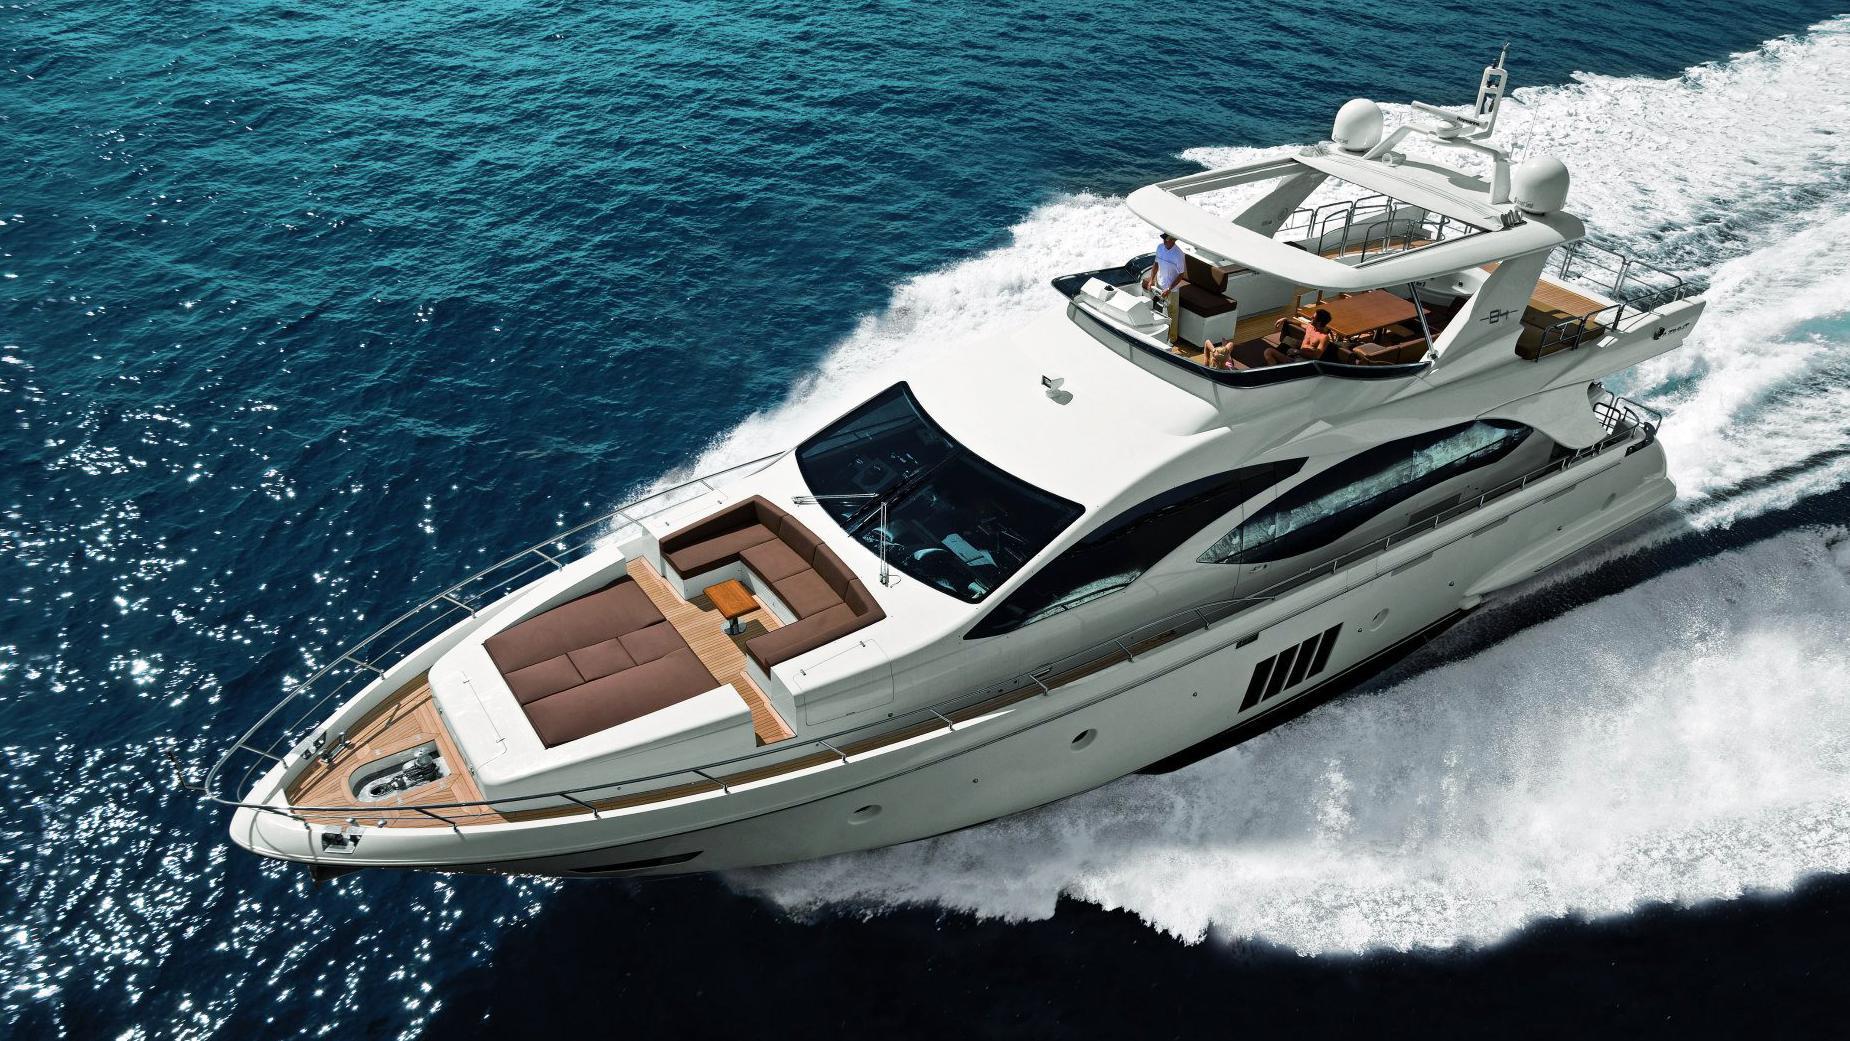 azimut-84-15-motor-yacht-2014-26m-aerialy